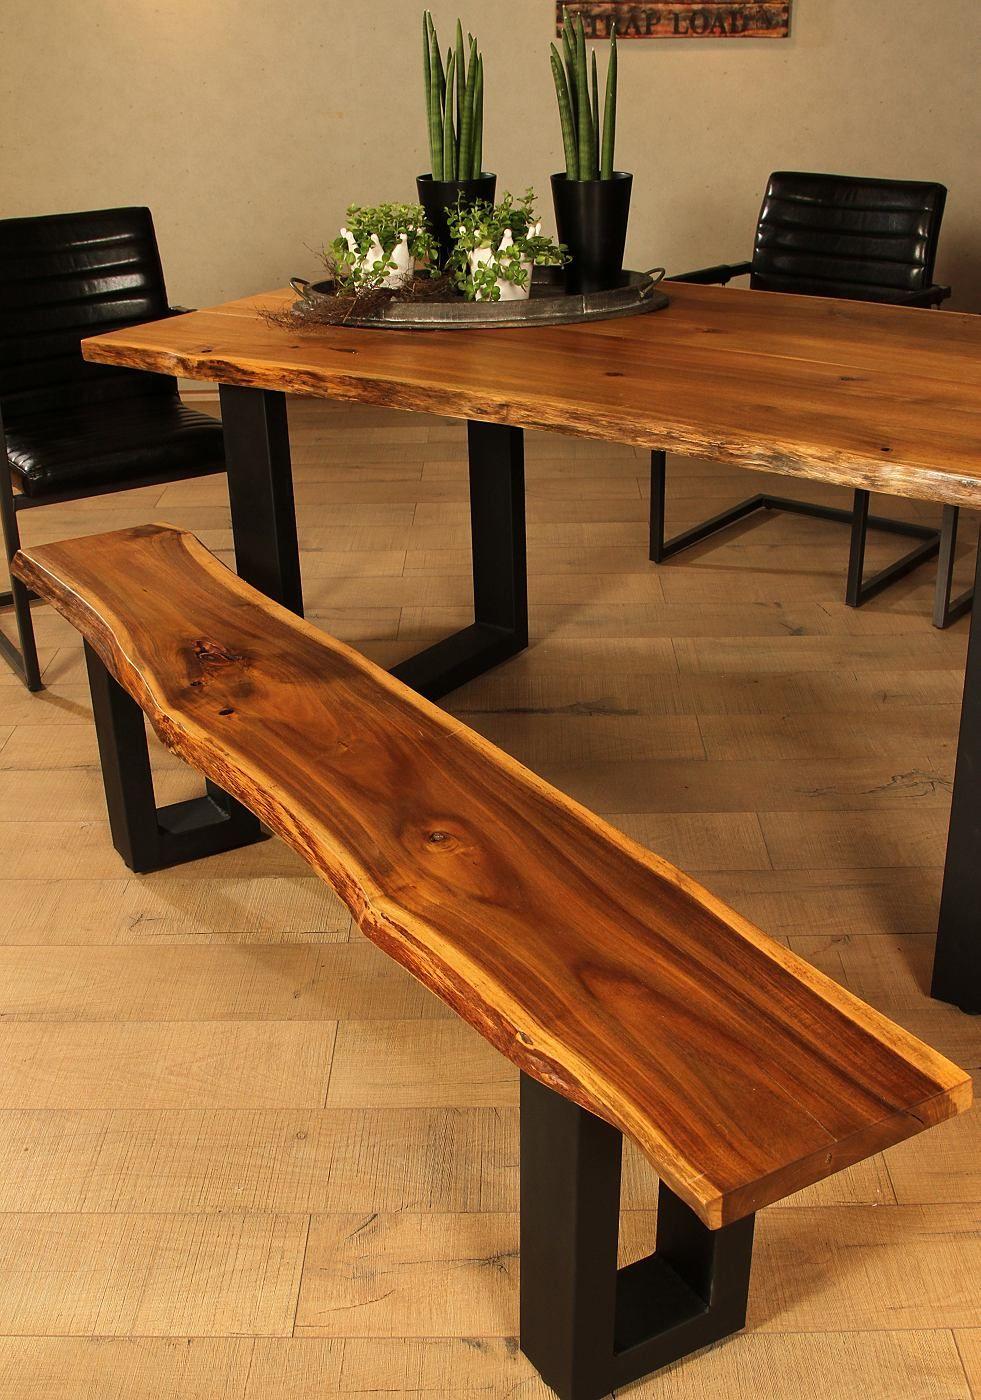 Sitzbank Premium Collection By Home Affaire Queens Online Kaufen Otto Holztisch Design Wood Slab Table Akazienholz Mobel